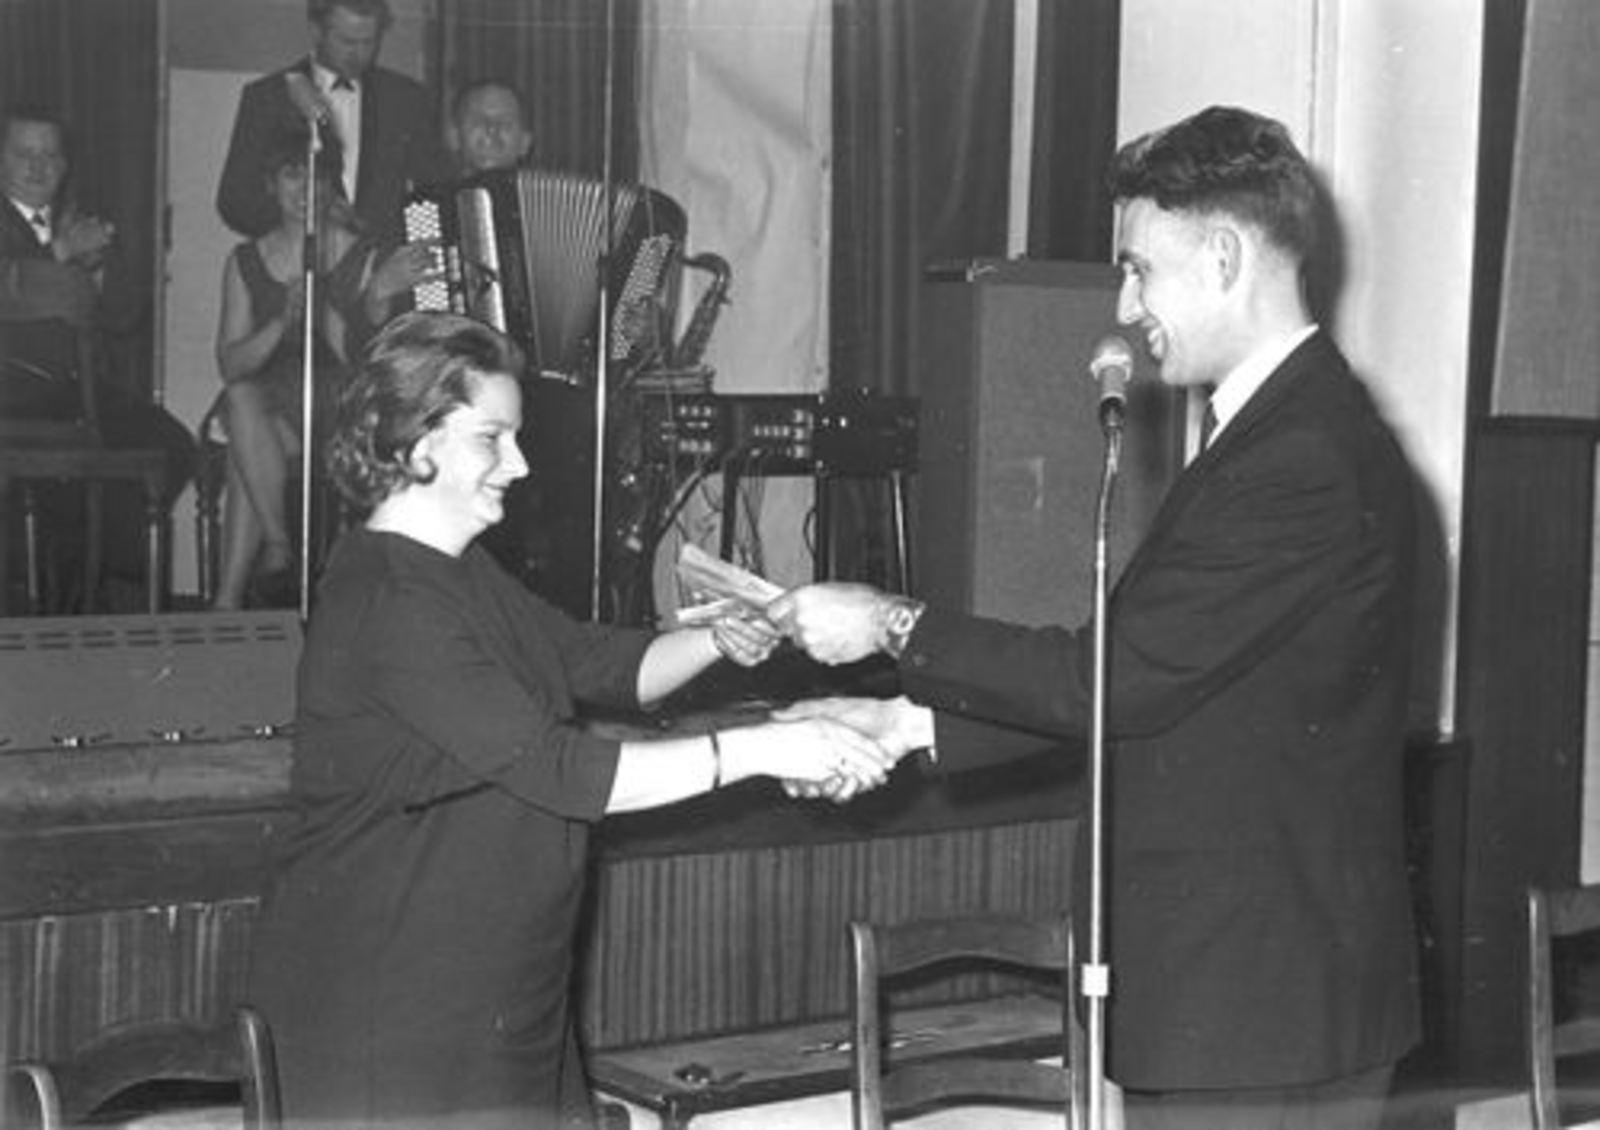 Winkeliersvereniging Hoofddorp 1969-70± Sinterklaas aktie 33